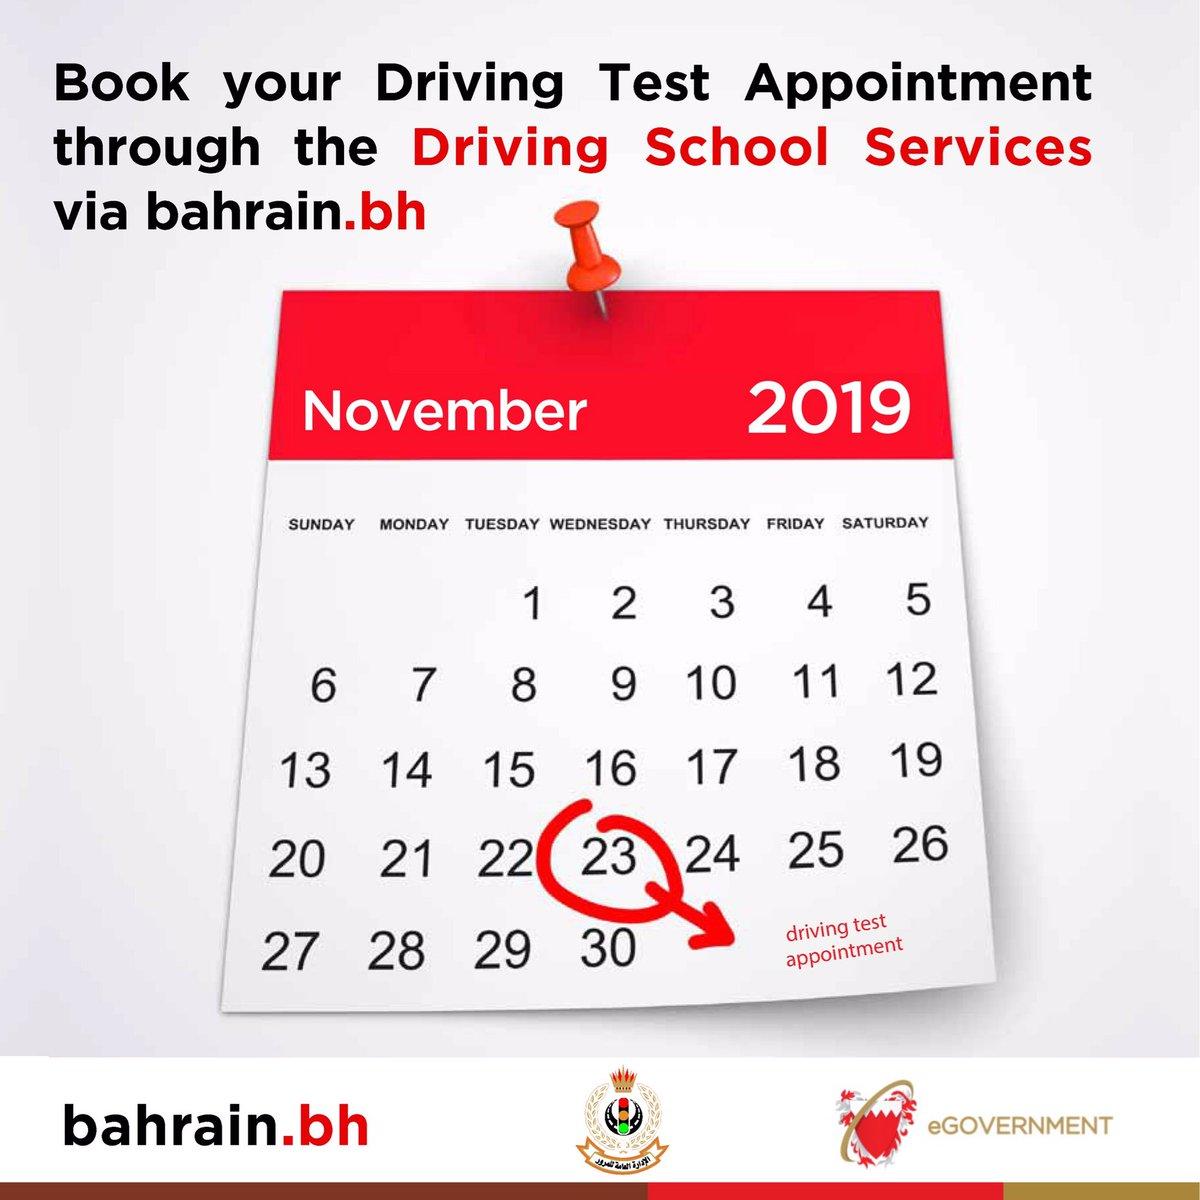 iGA Bahrain on Twitter: